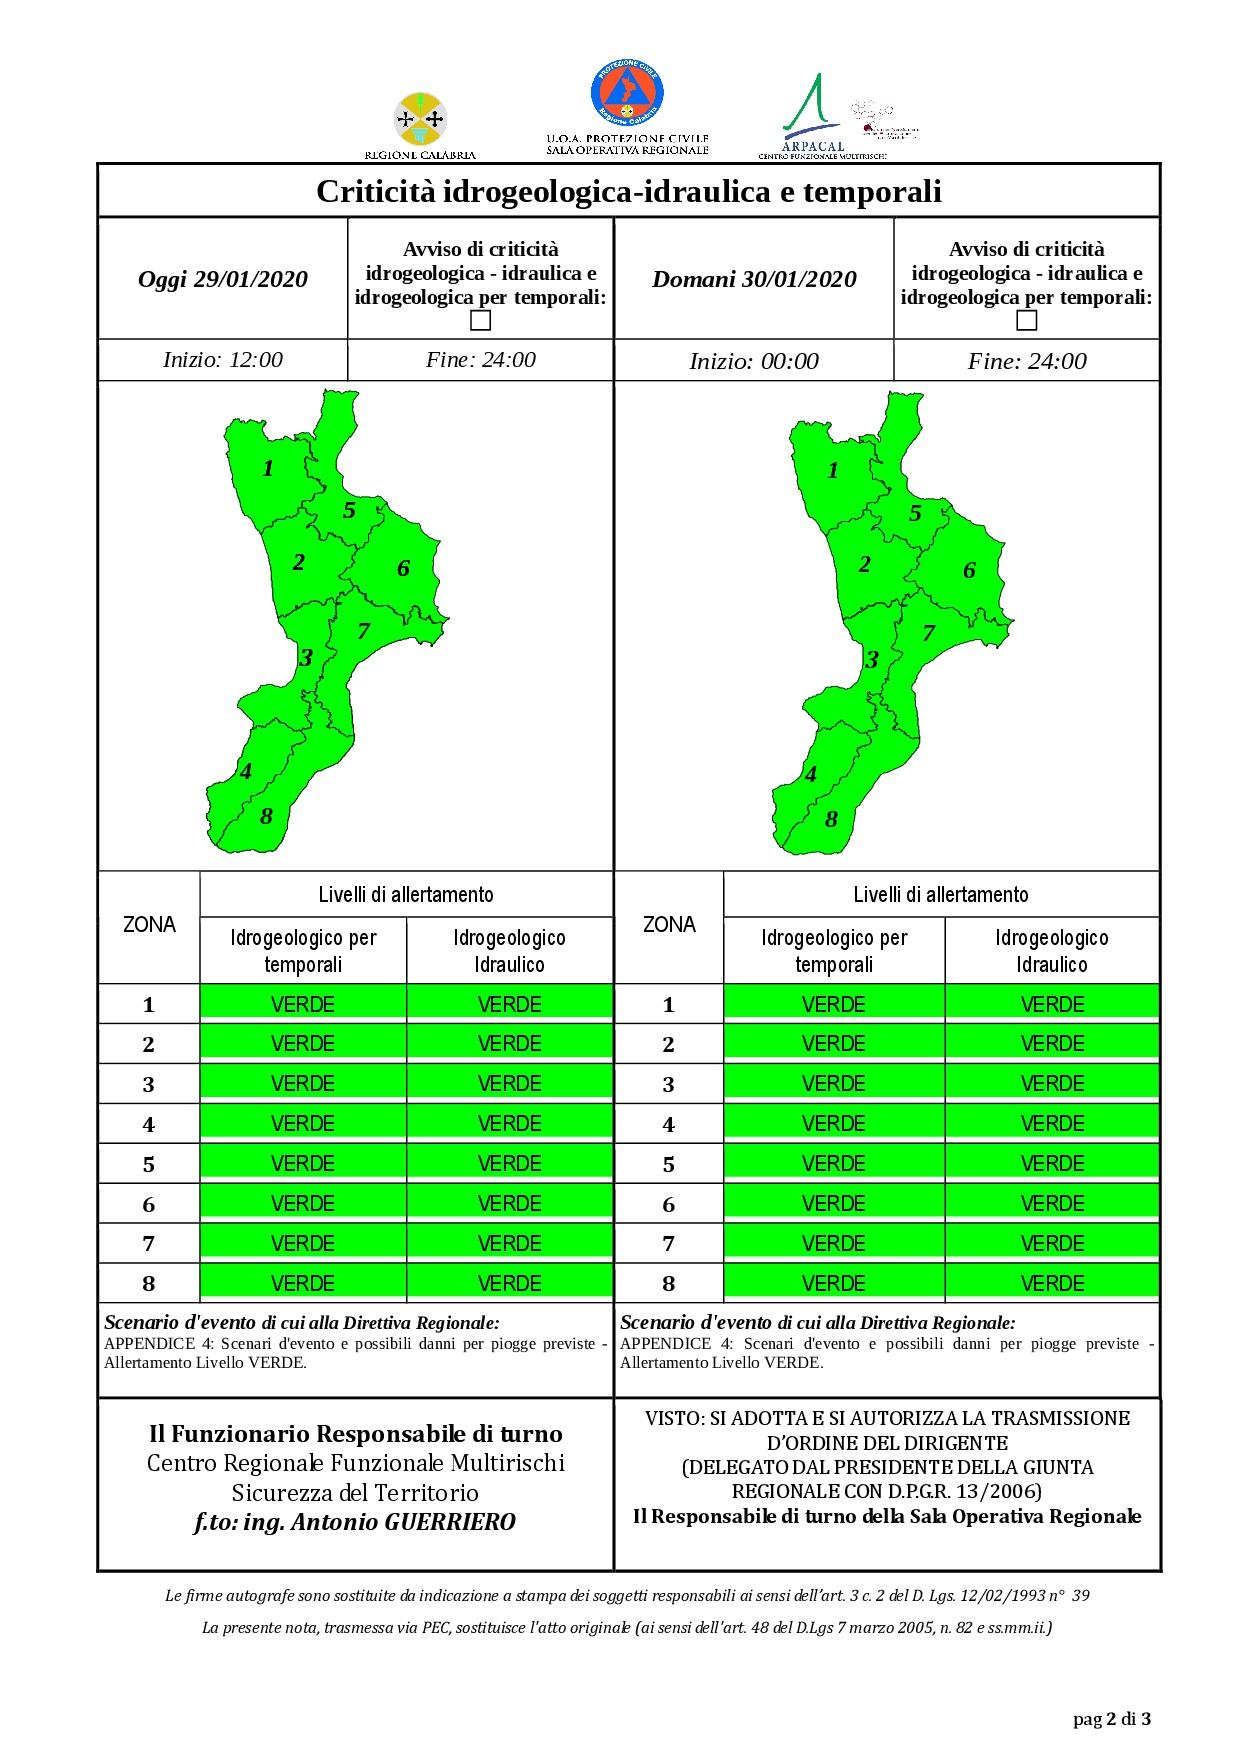 Criticità idrogeologica-idraulica e temporali in Calabria 29-01-2020